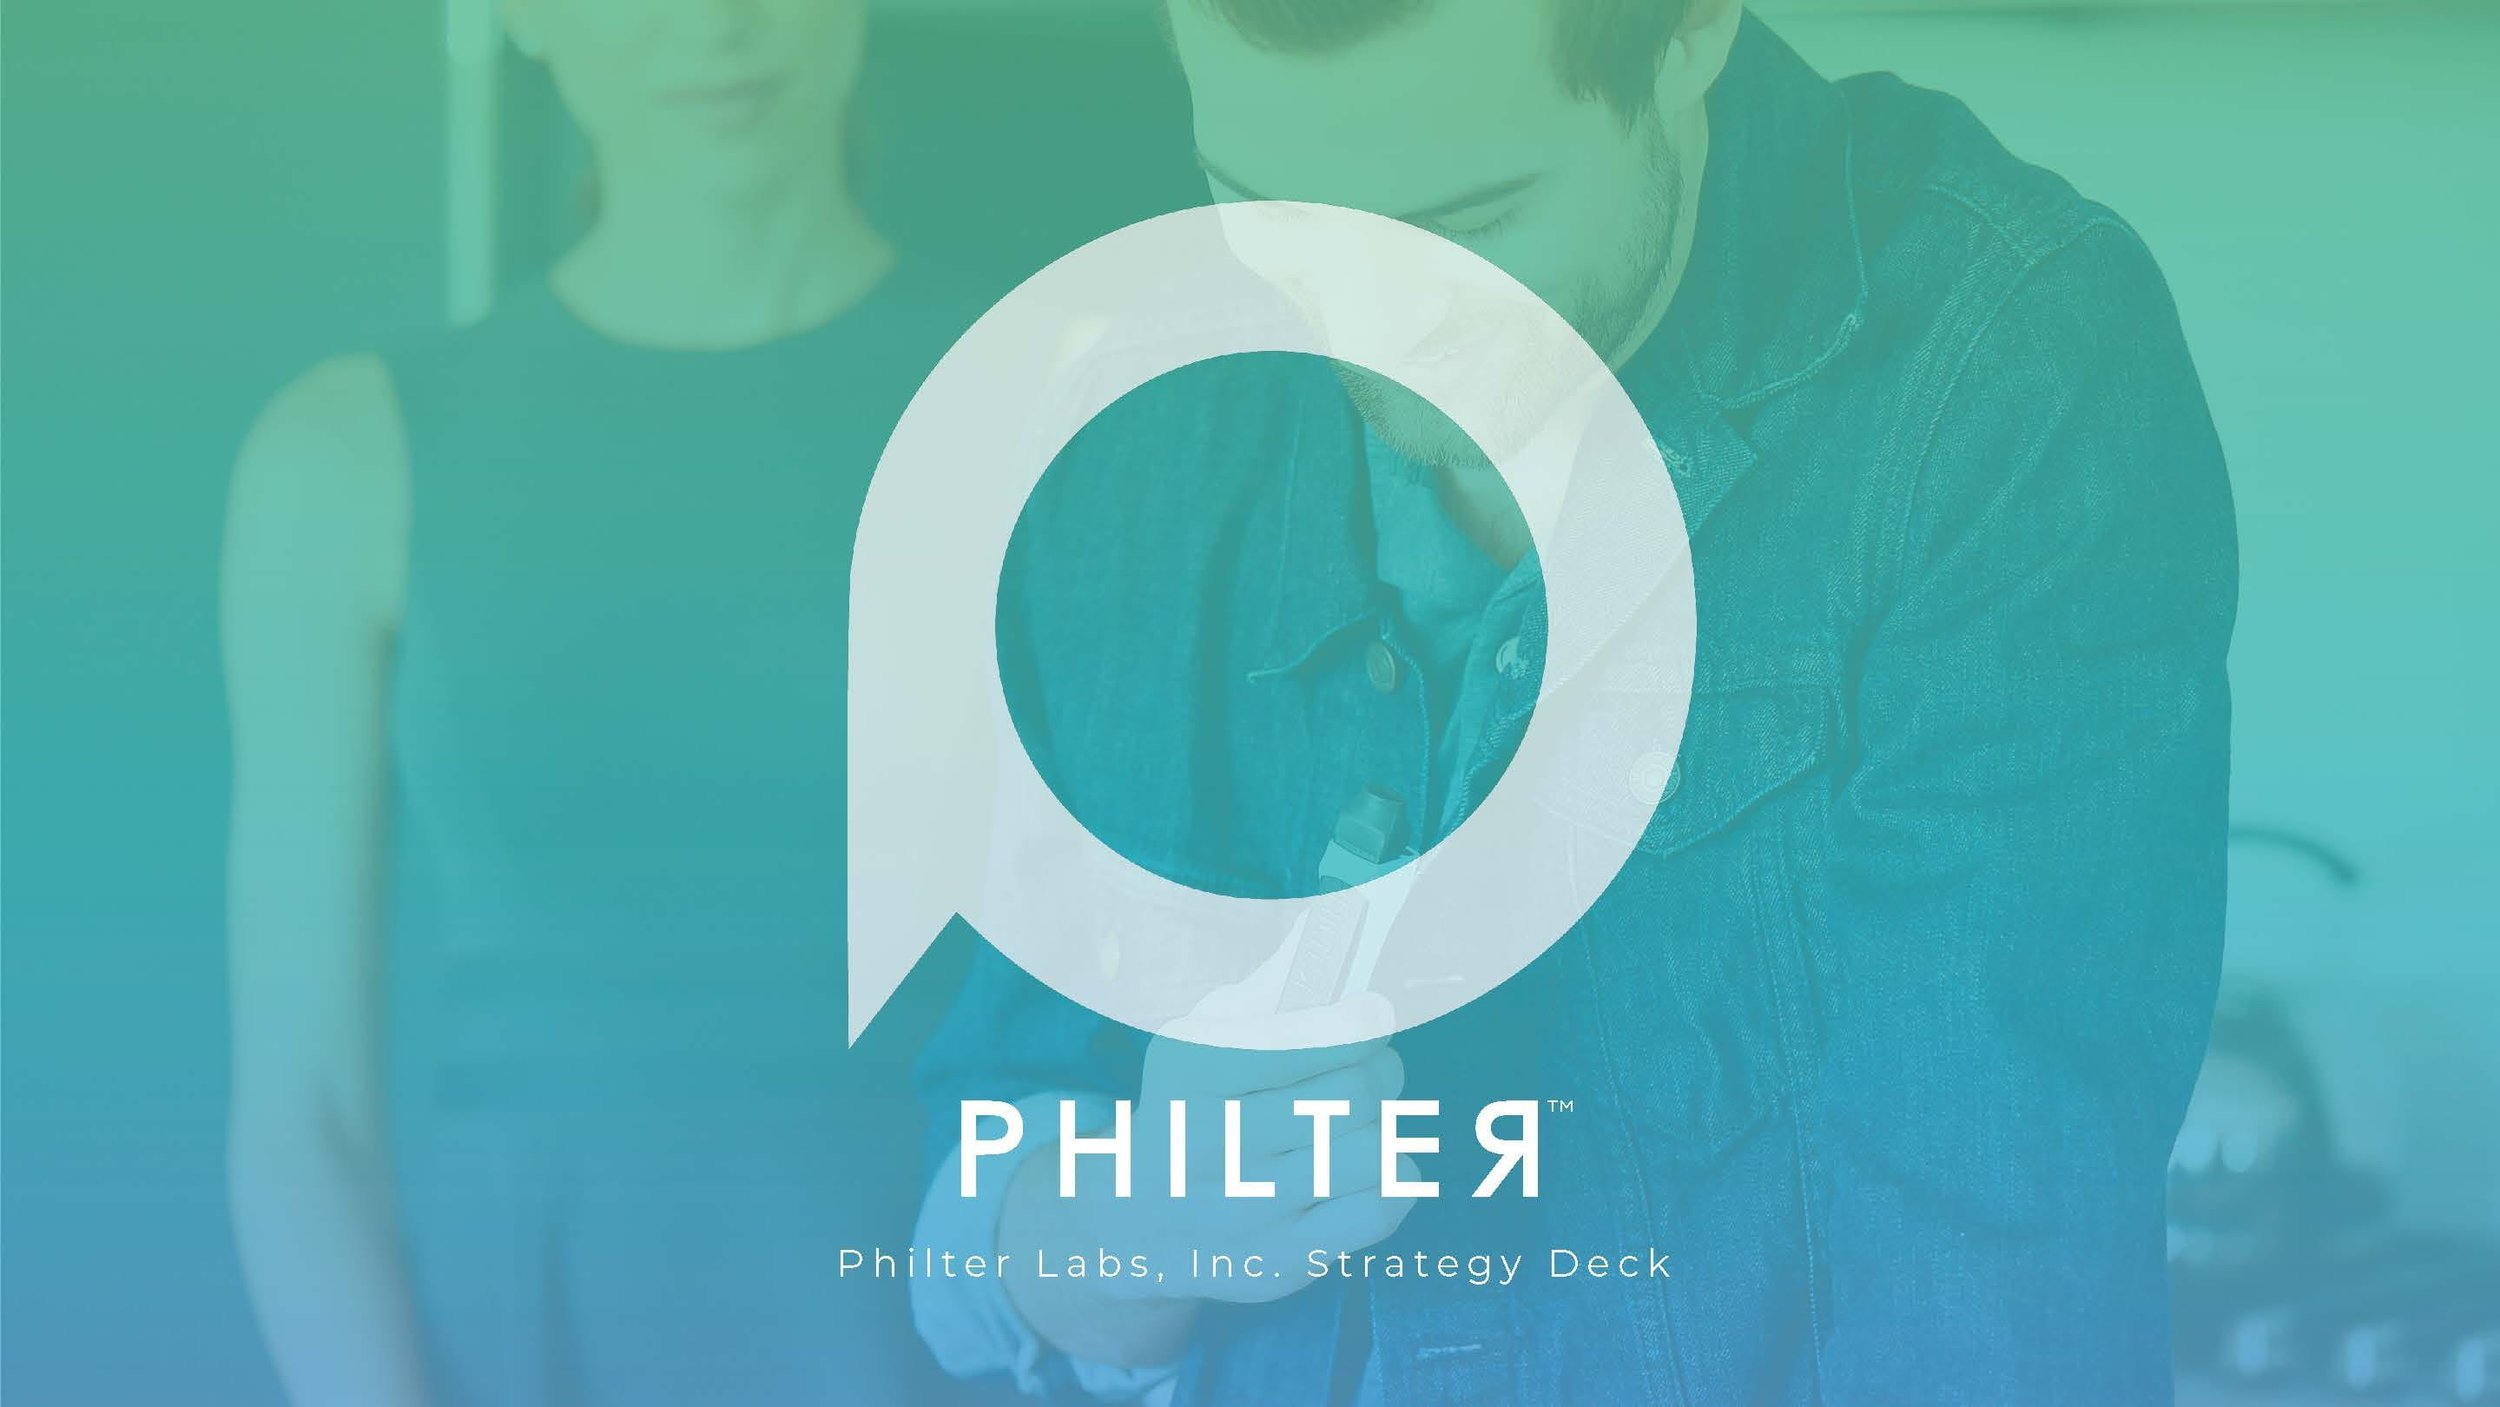 Philter-Strategy-Deck_design_v01_Page_01.jpg